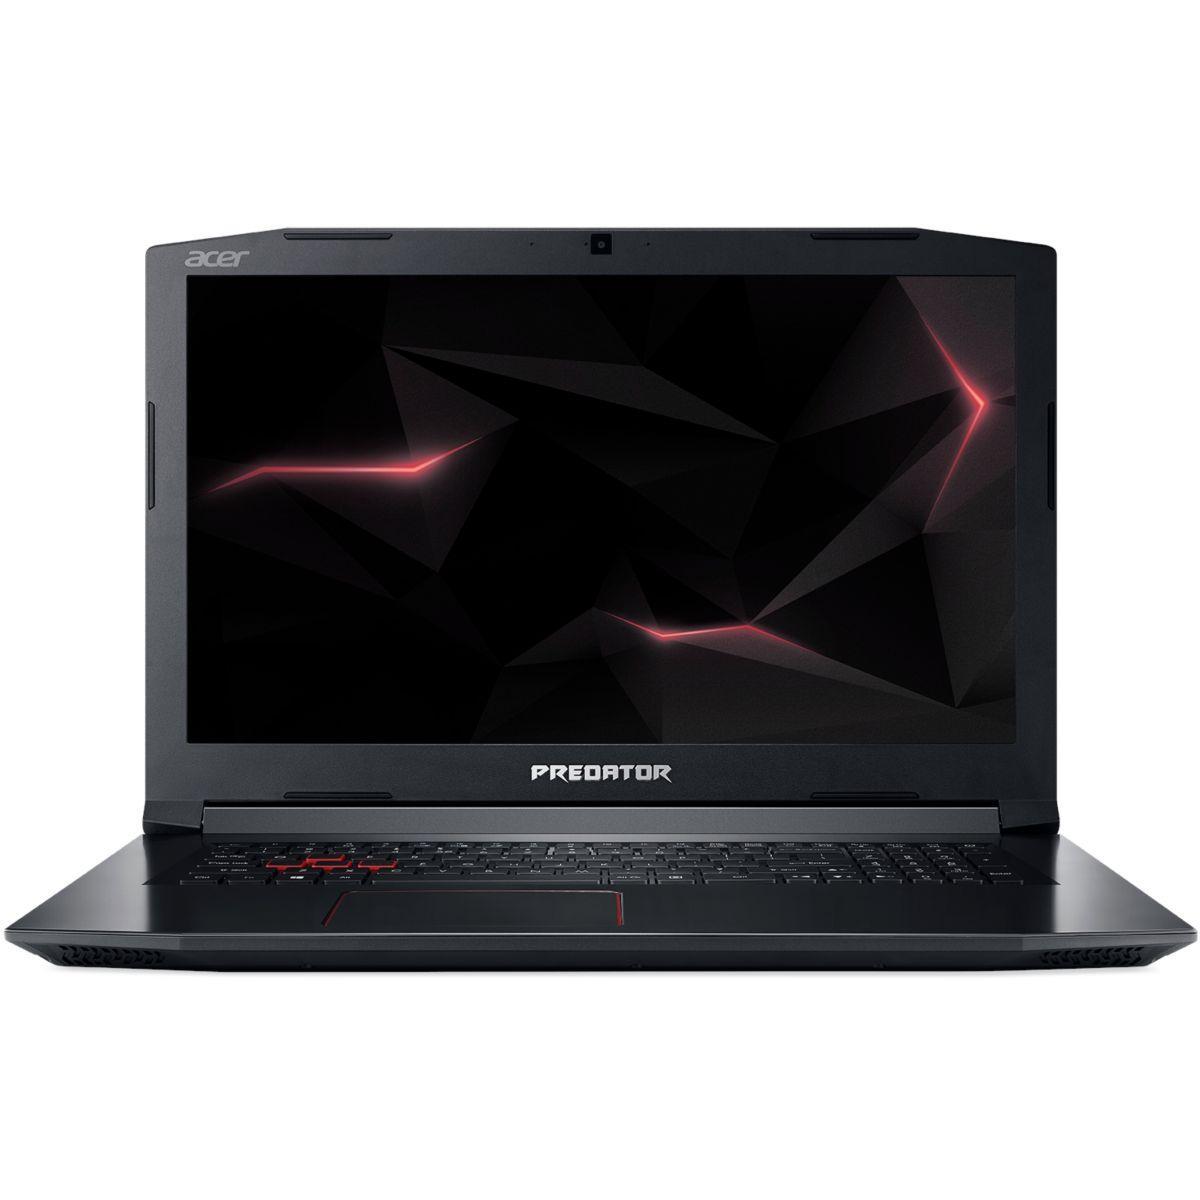 Pc gamer acer predator helios 300 ph317-52-77lx - livraison offerte : code premium